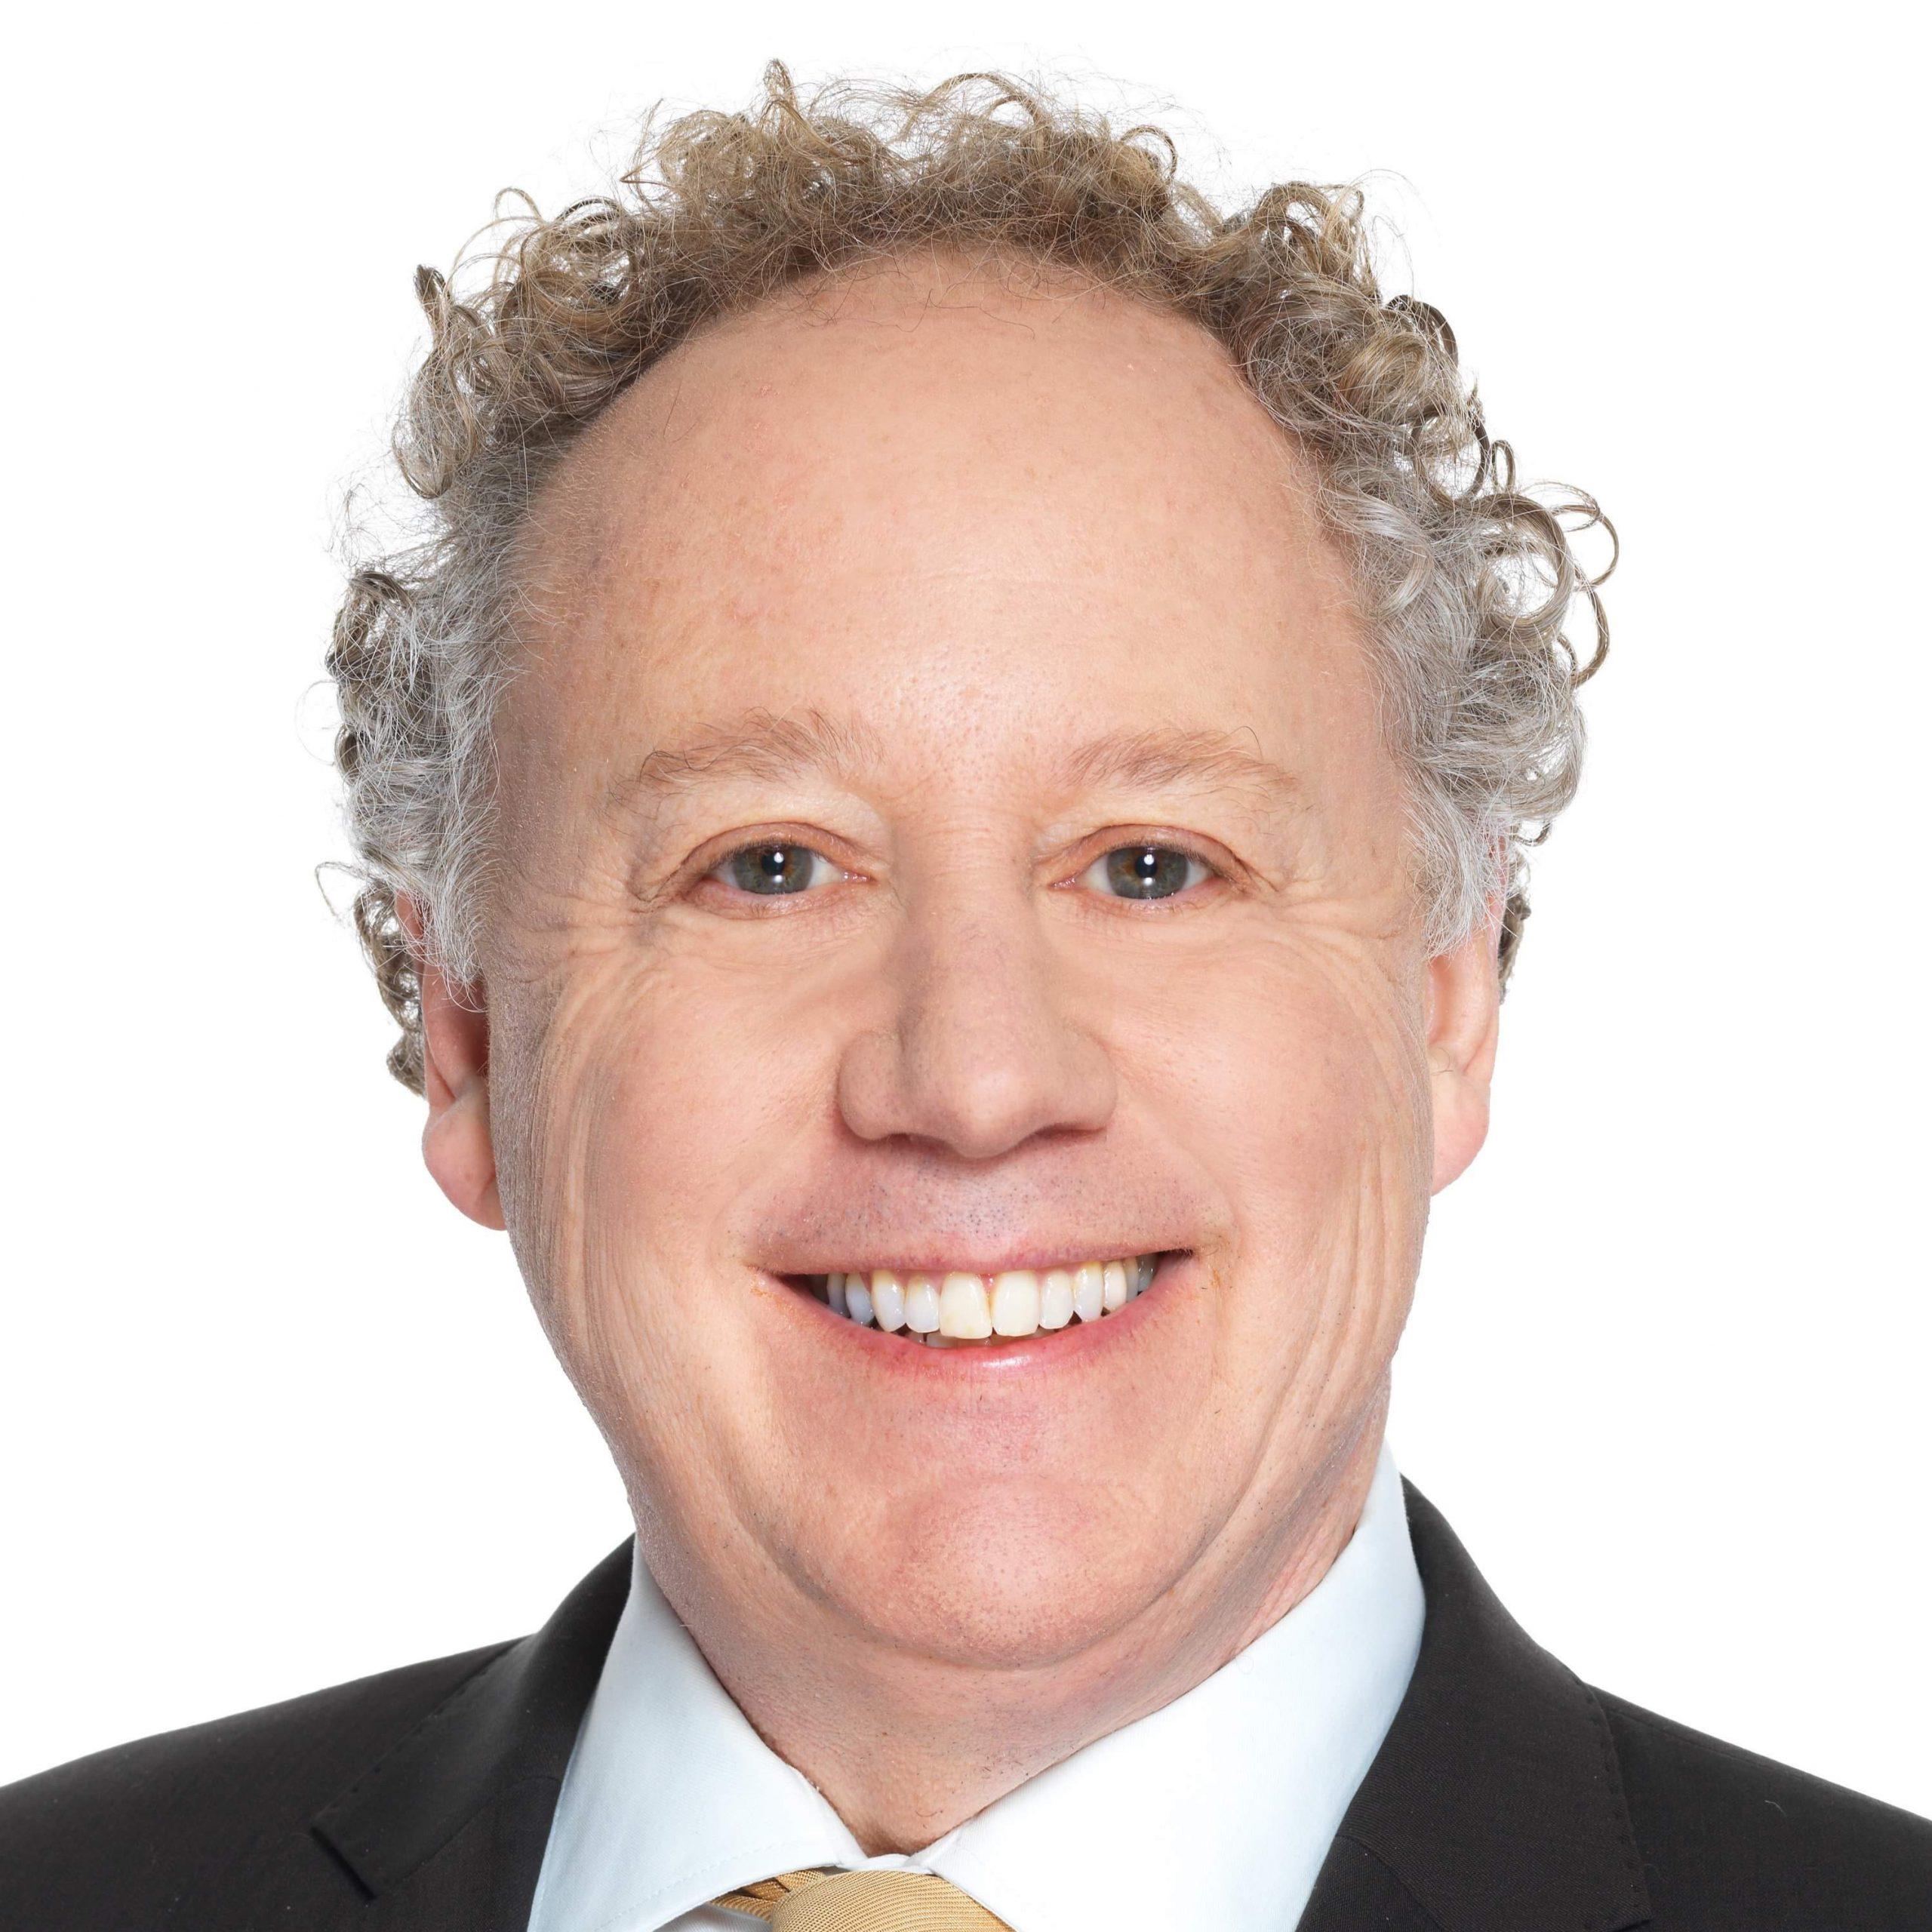 Bob Zuckerman